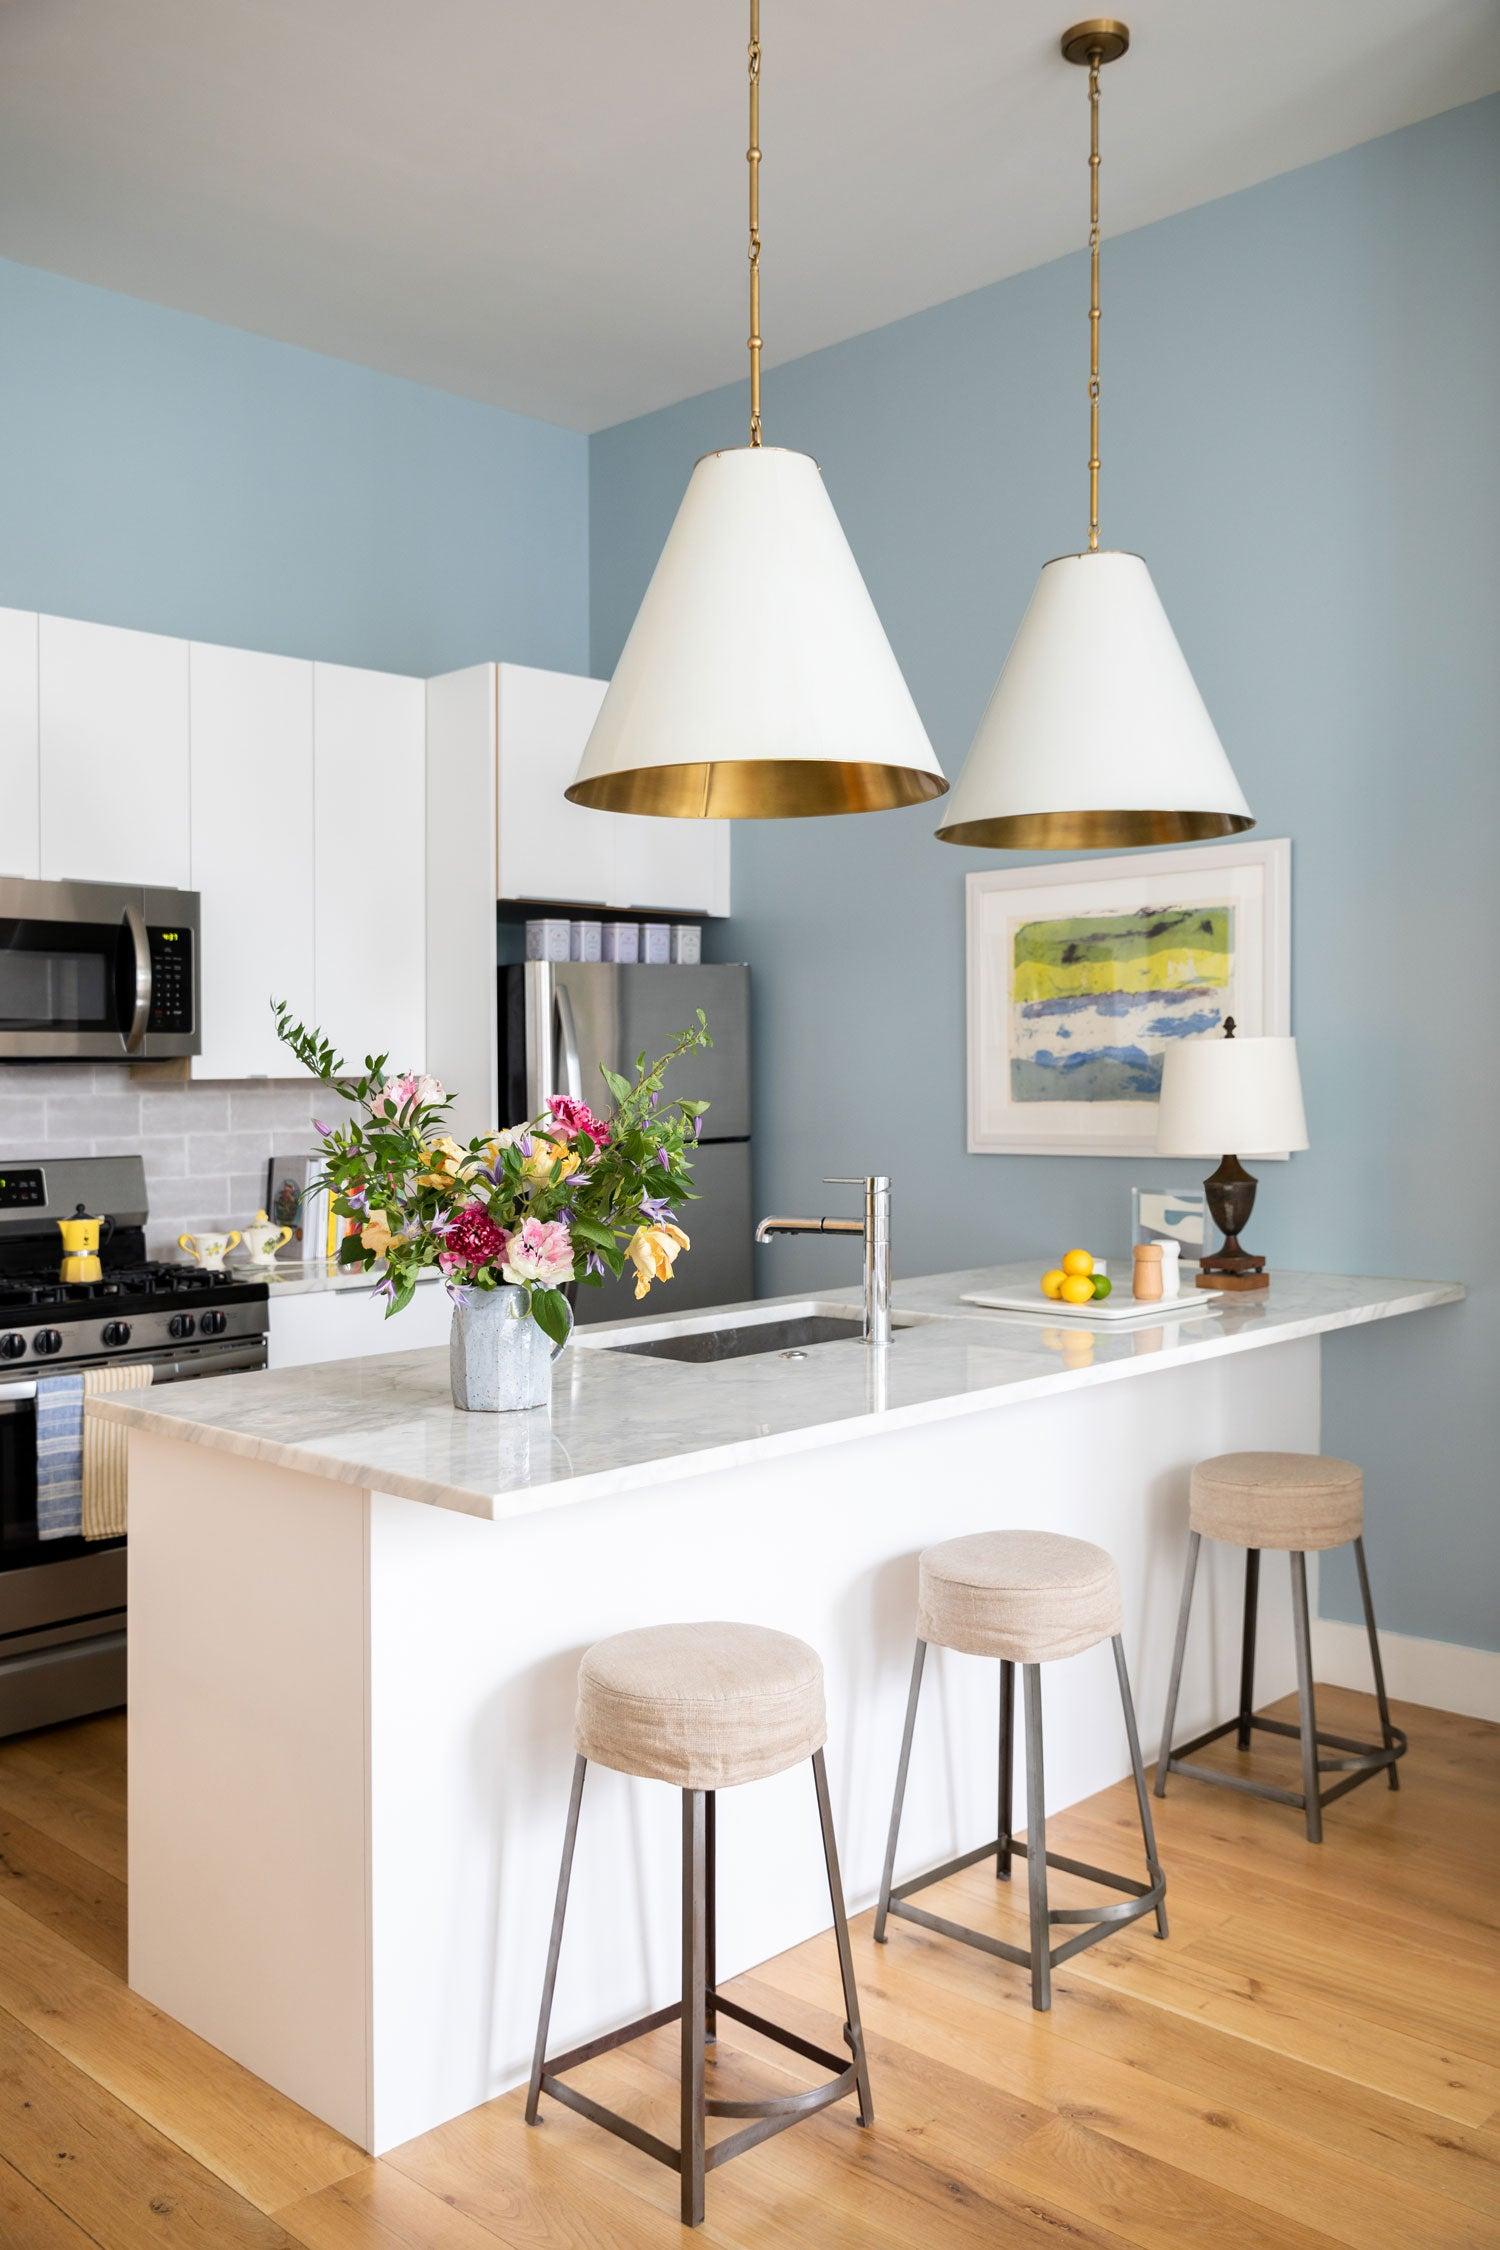 Rental Kitchen With Blue Walls